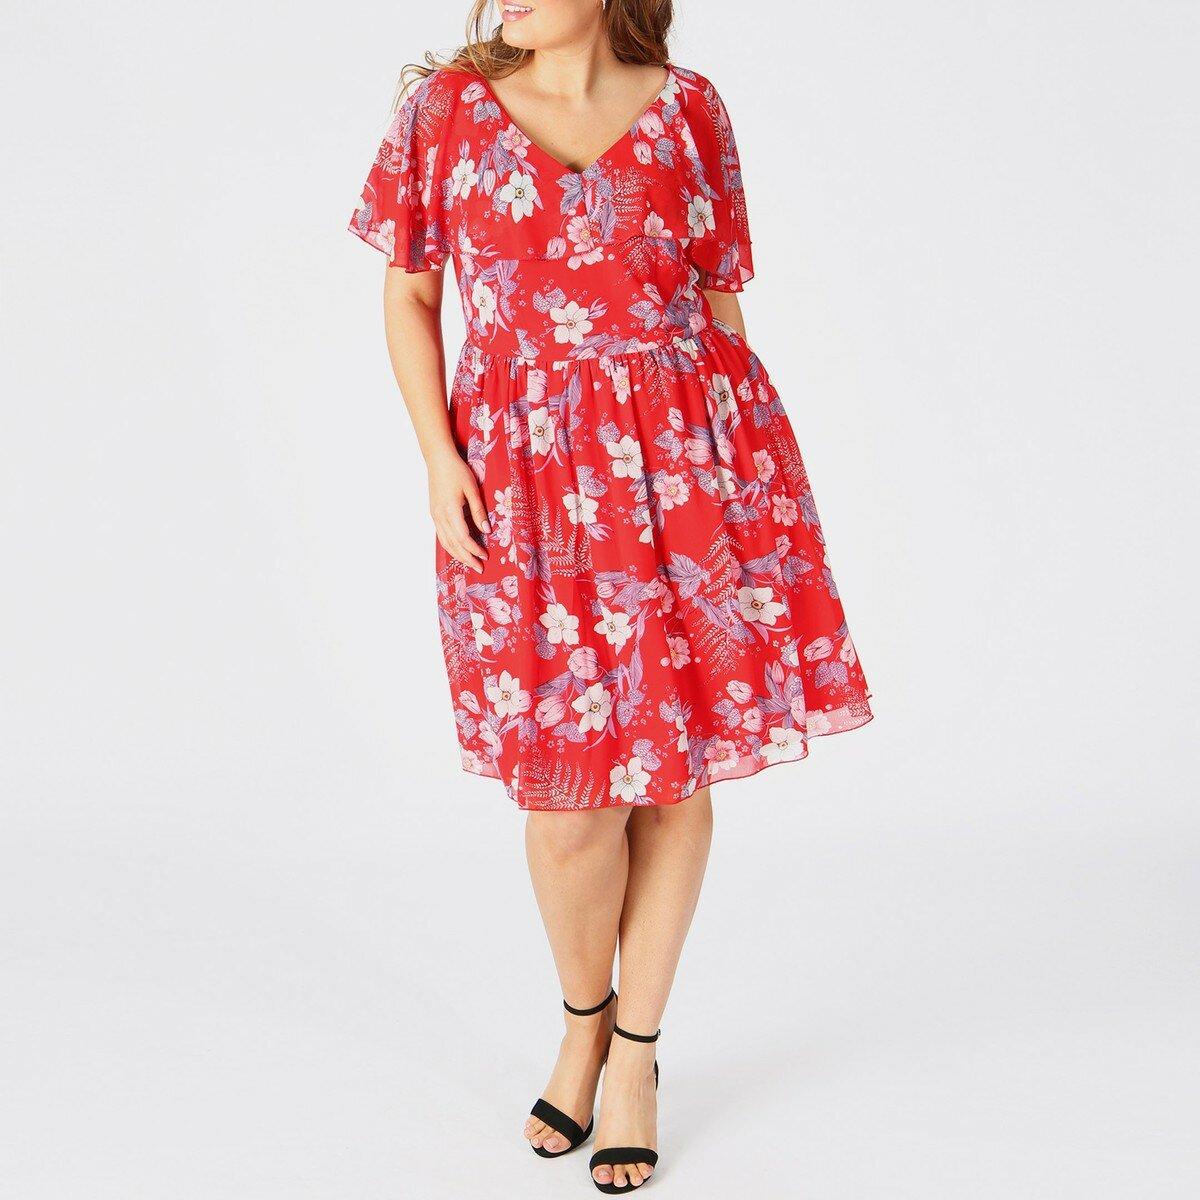 Платье-миди La Redoute Расклешенное с рисунком и короткими рукавами